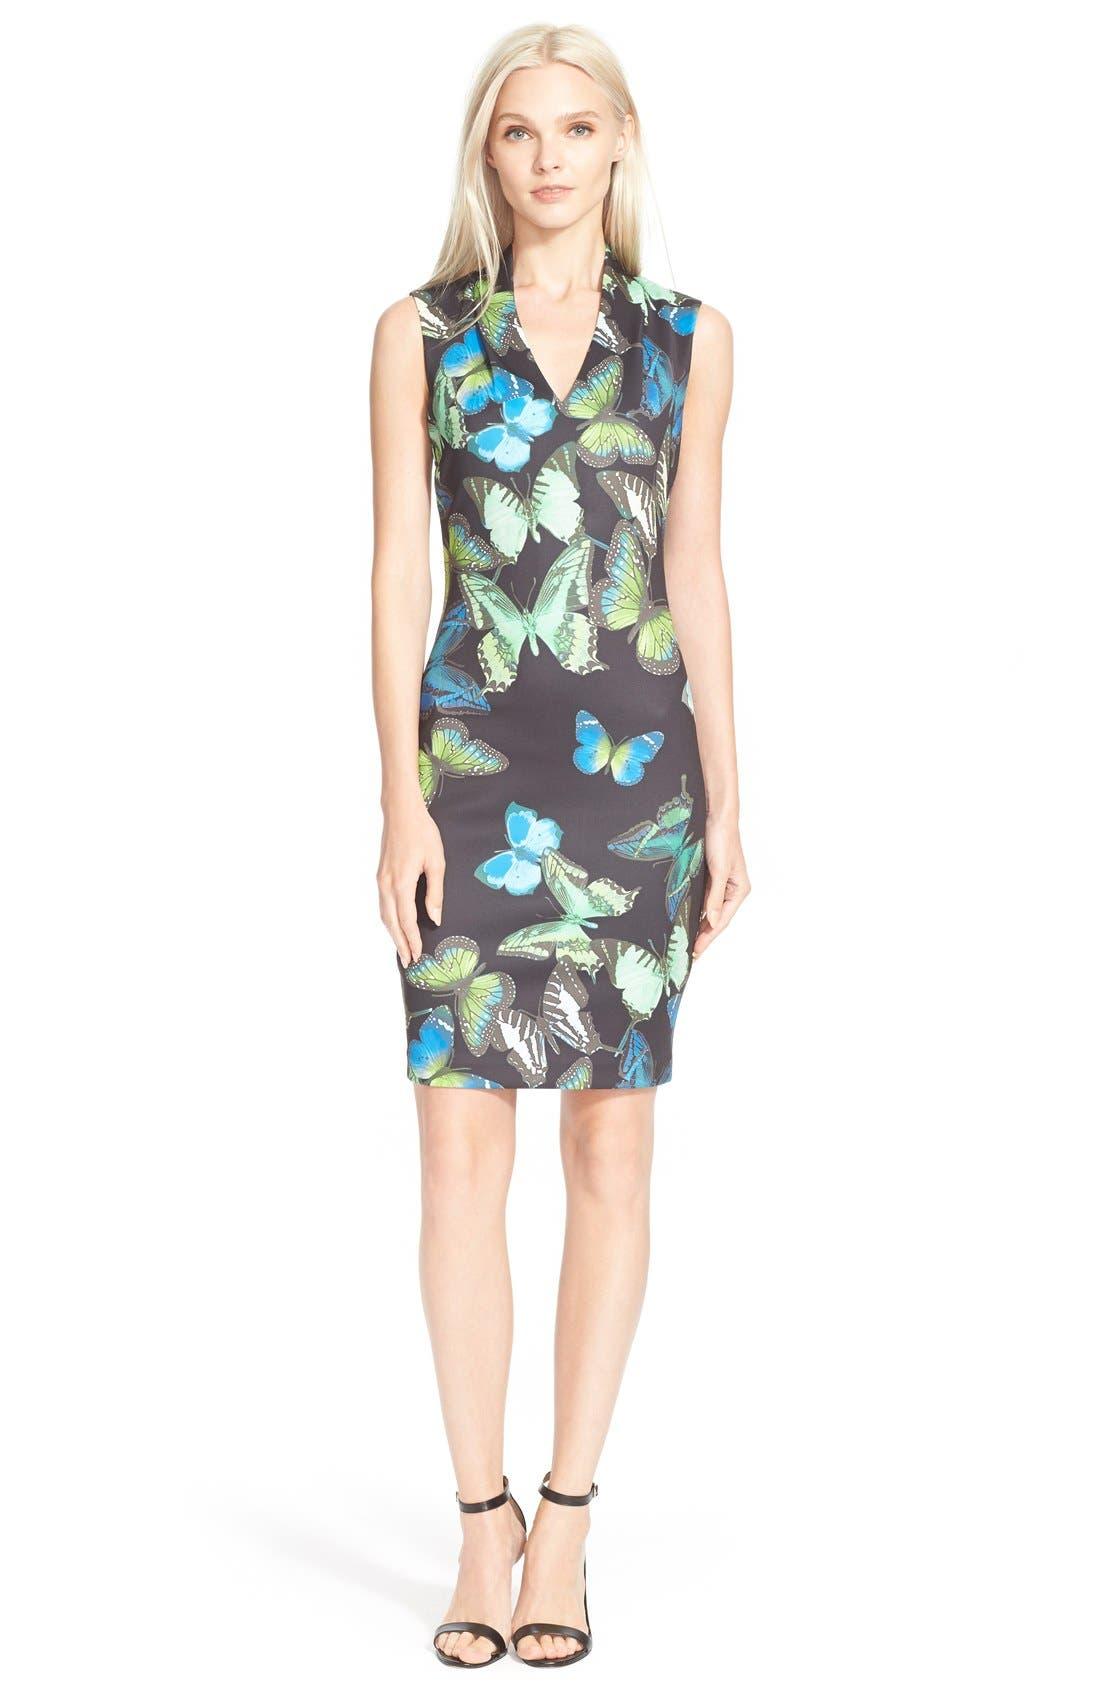 Alternate Image 1 Selected - Ted Baker London 'Aly' Butterfly Print Neoprene Body-Con Dress